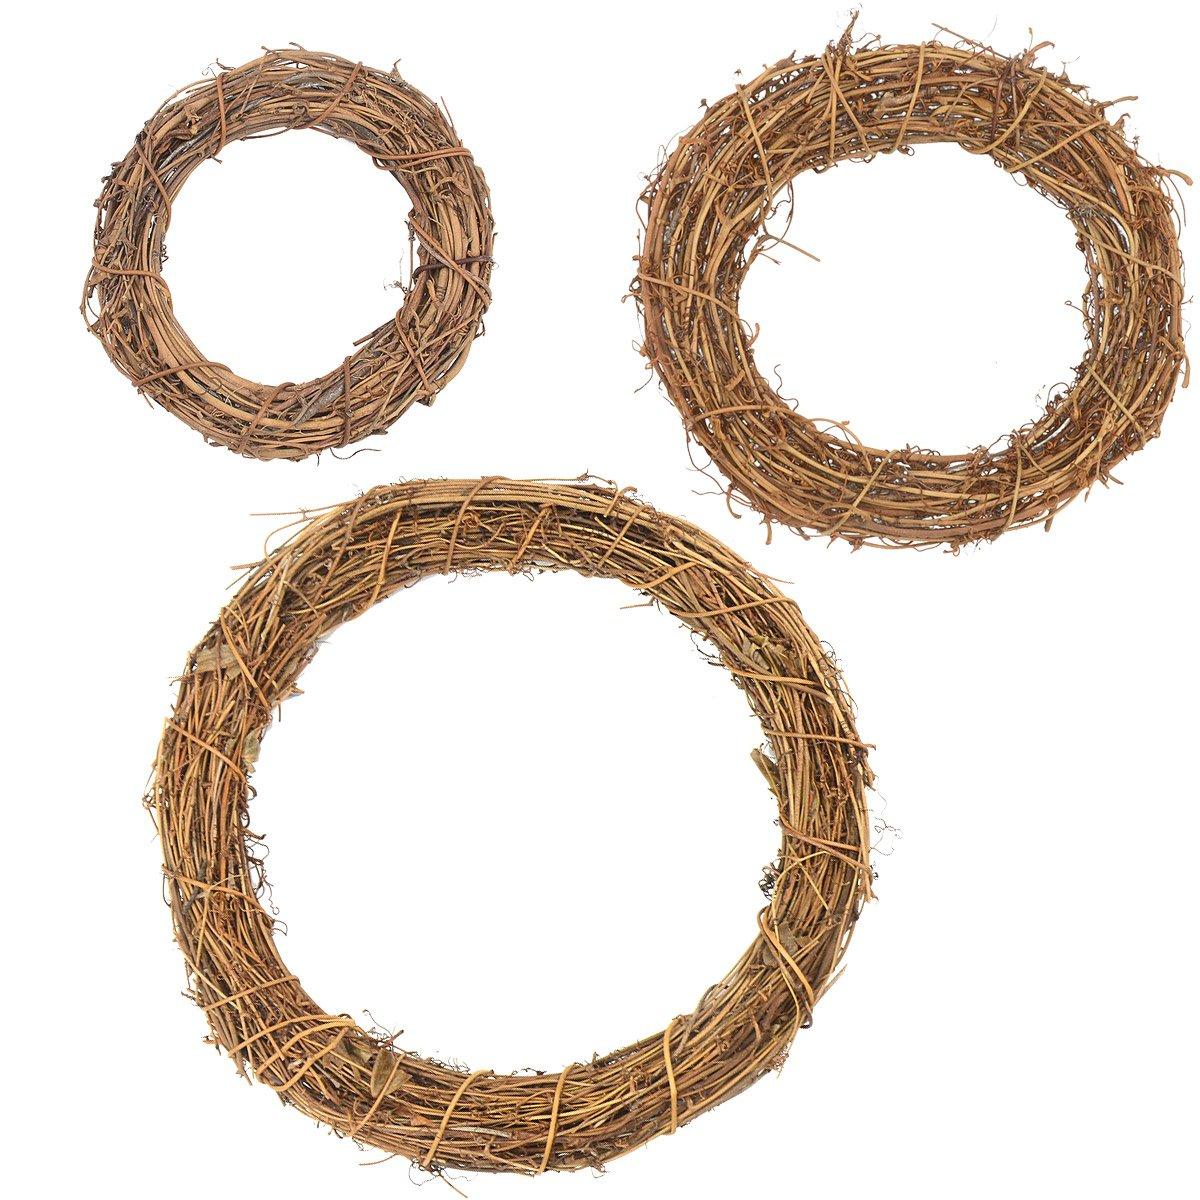 3Pcs Natural Dried 20cm Round Rattan Handmade Garland Wreath Xmas Wedding Home Garden Decor GardeningWill